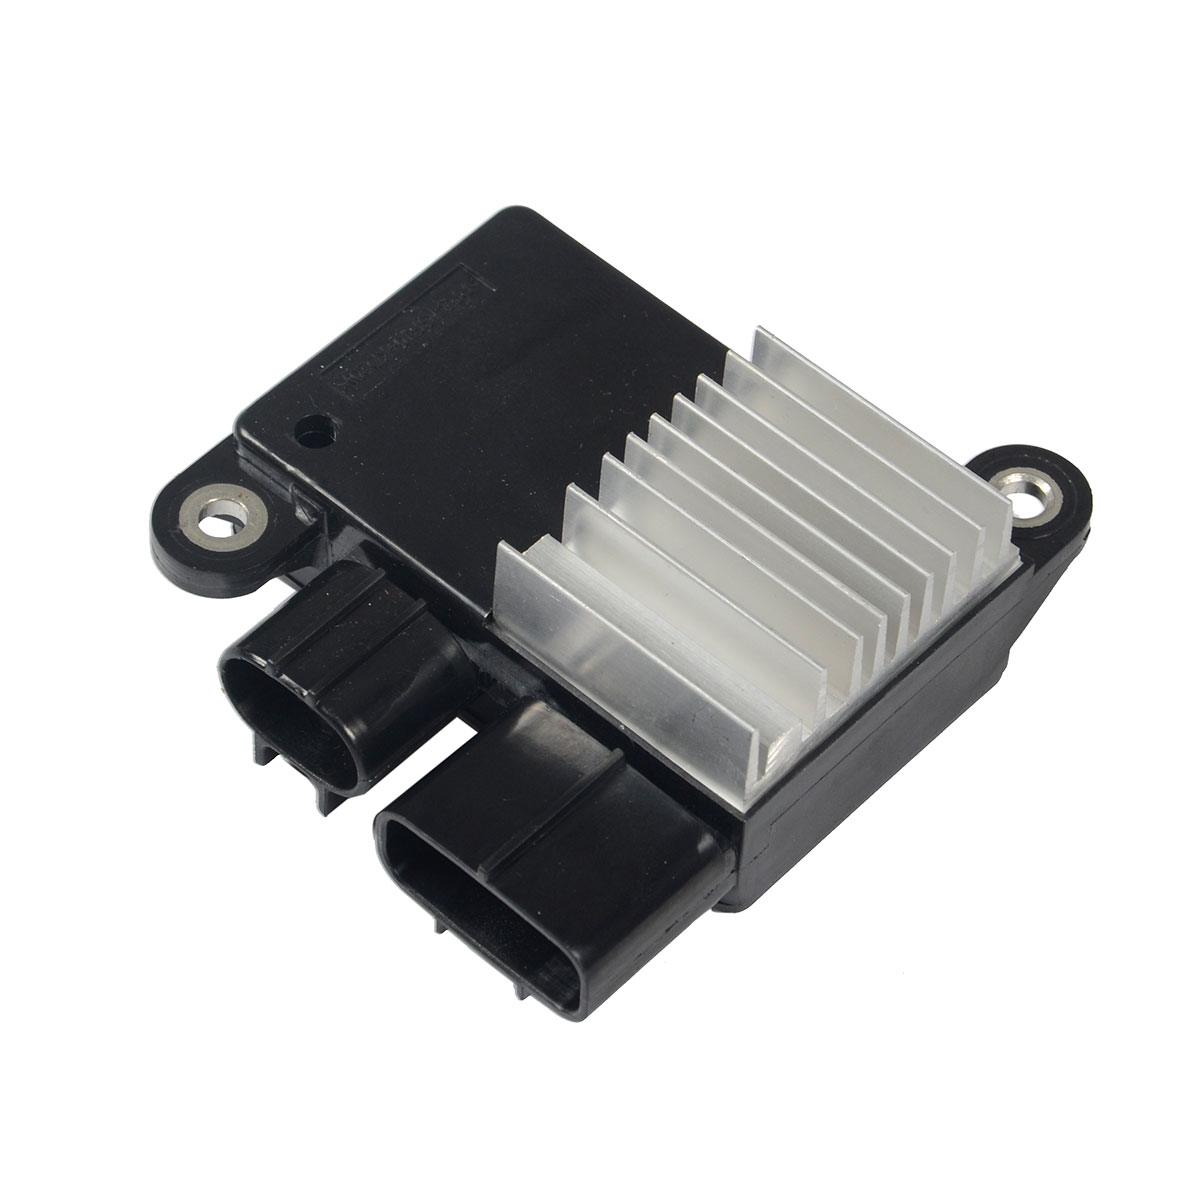 US $36 99 |Aliexpress com : Buy Cooling Fan Control Unit Module ECU ECM for  Toyota Corolla Matrix Mazda 5 CX 7 from Reliable ecm suppliers on